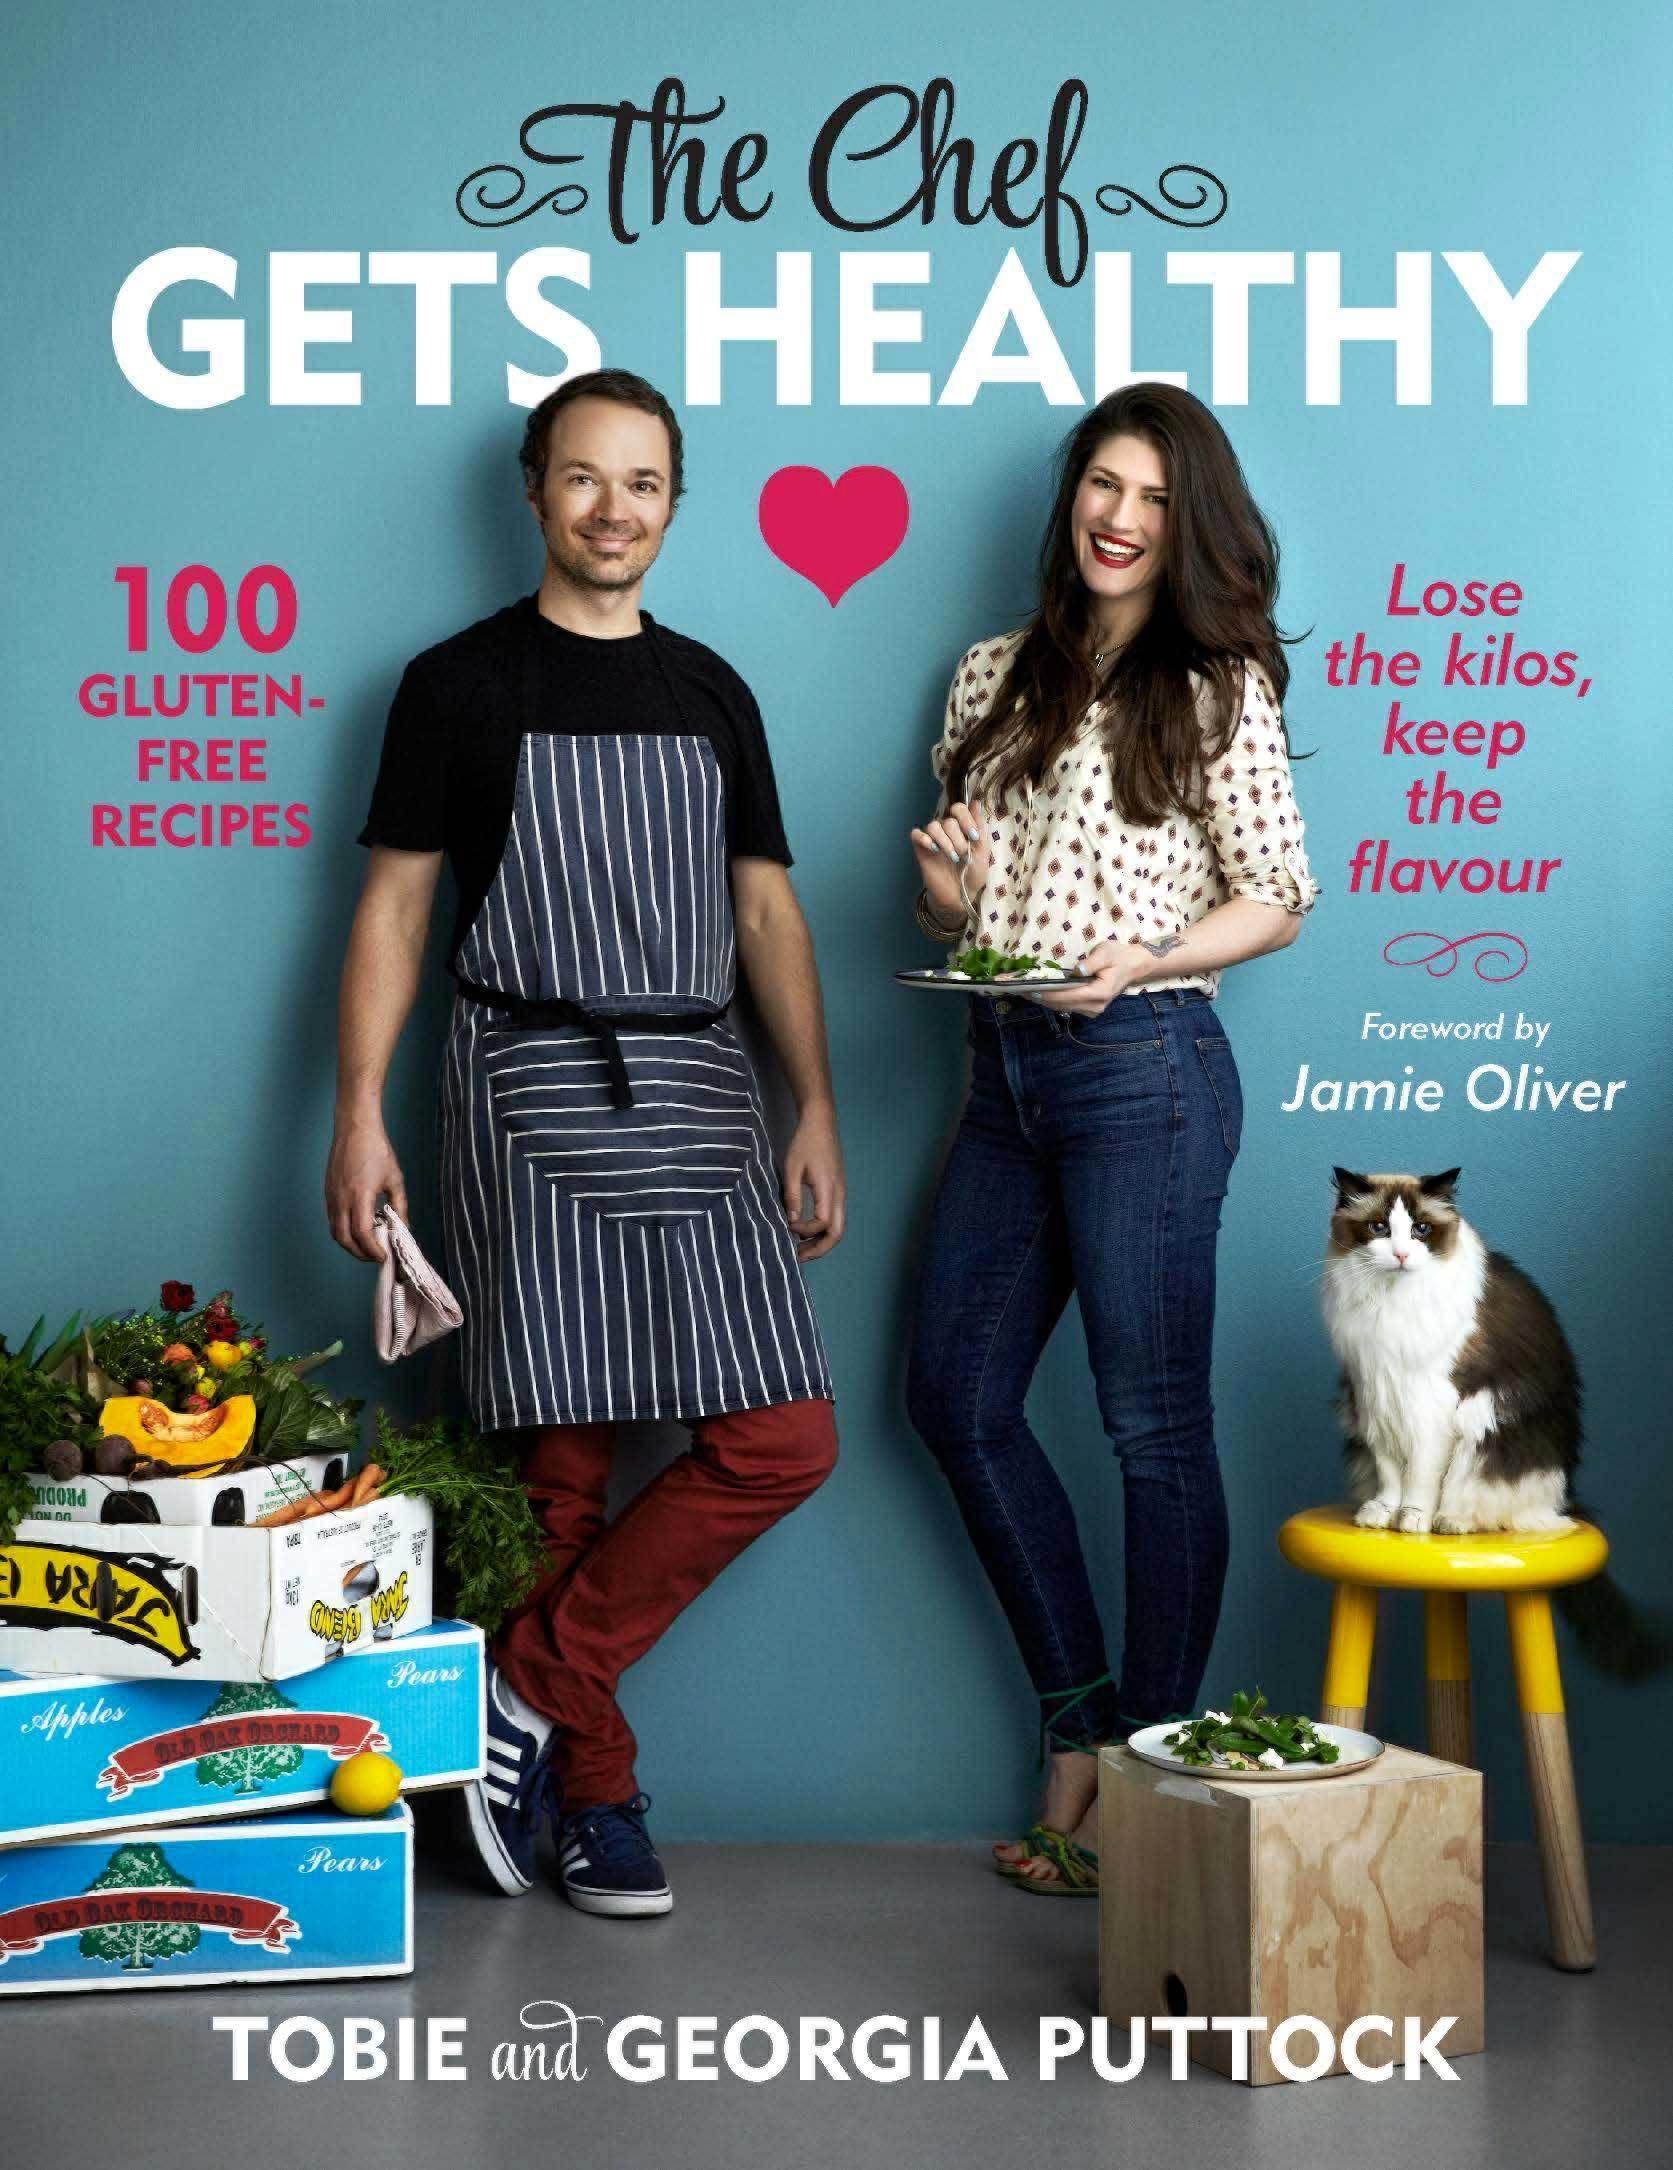 The ChefGetsHealthy